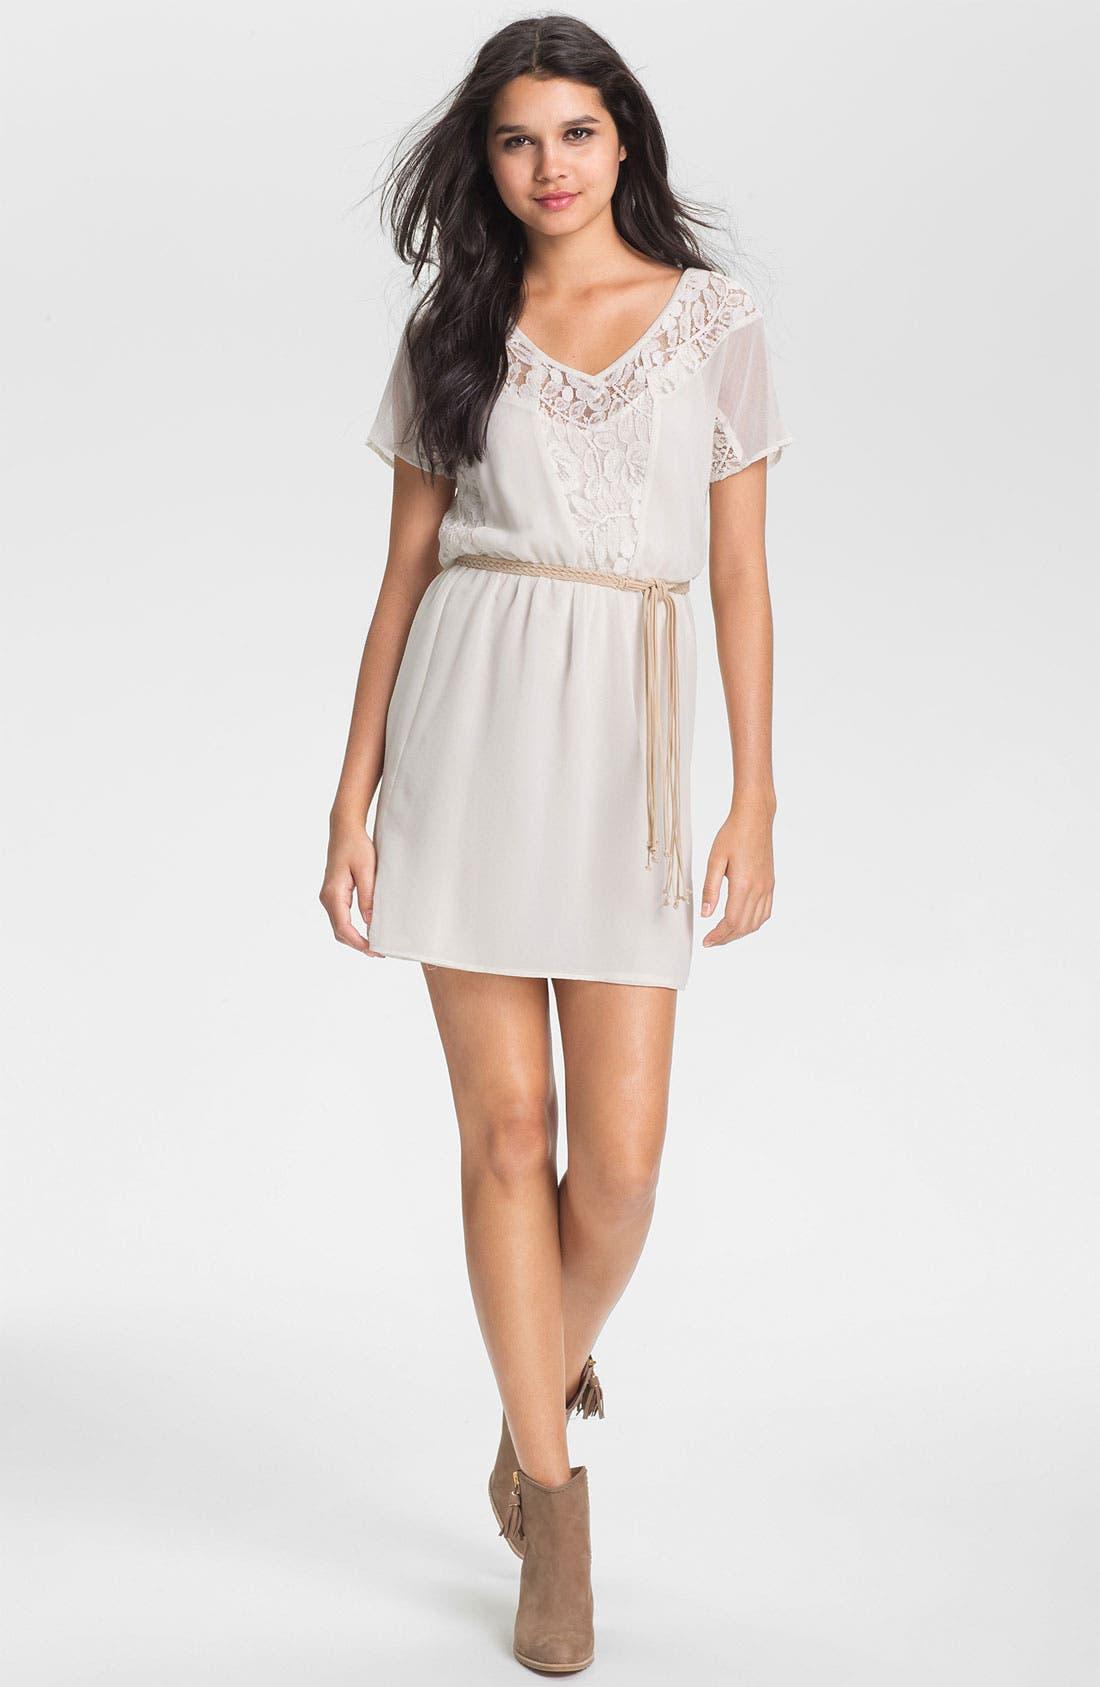 Alternate Image 1 Selected - Sanctuary Braided Belt Lace Trim Dress